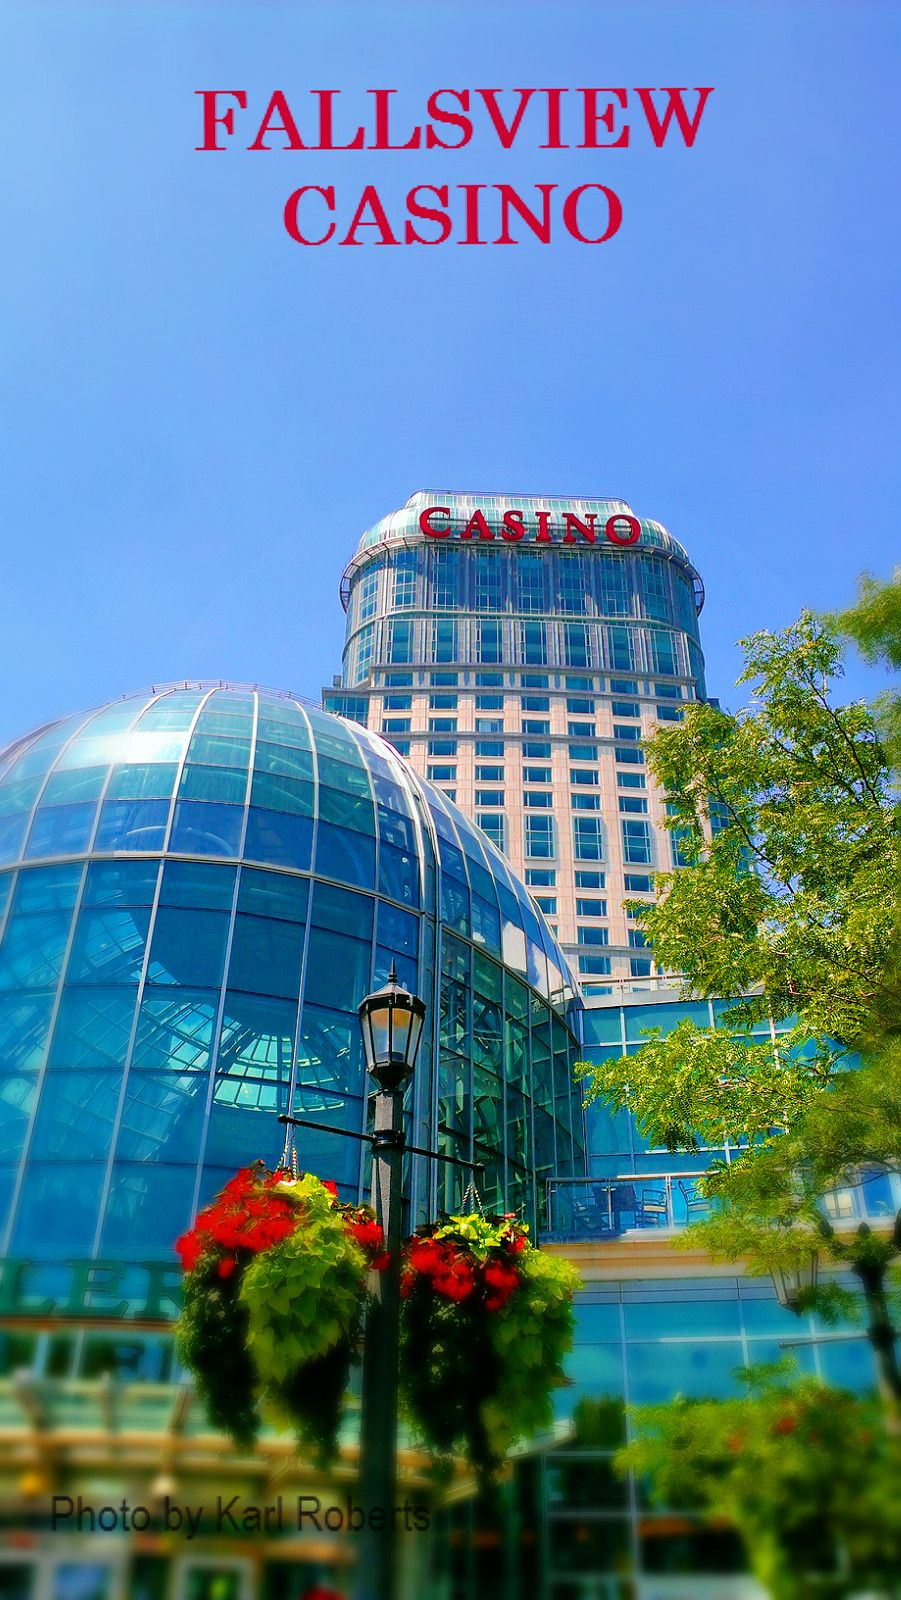 Niagara falls ontario fallsview casino wheeling casino dog racing